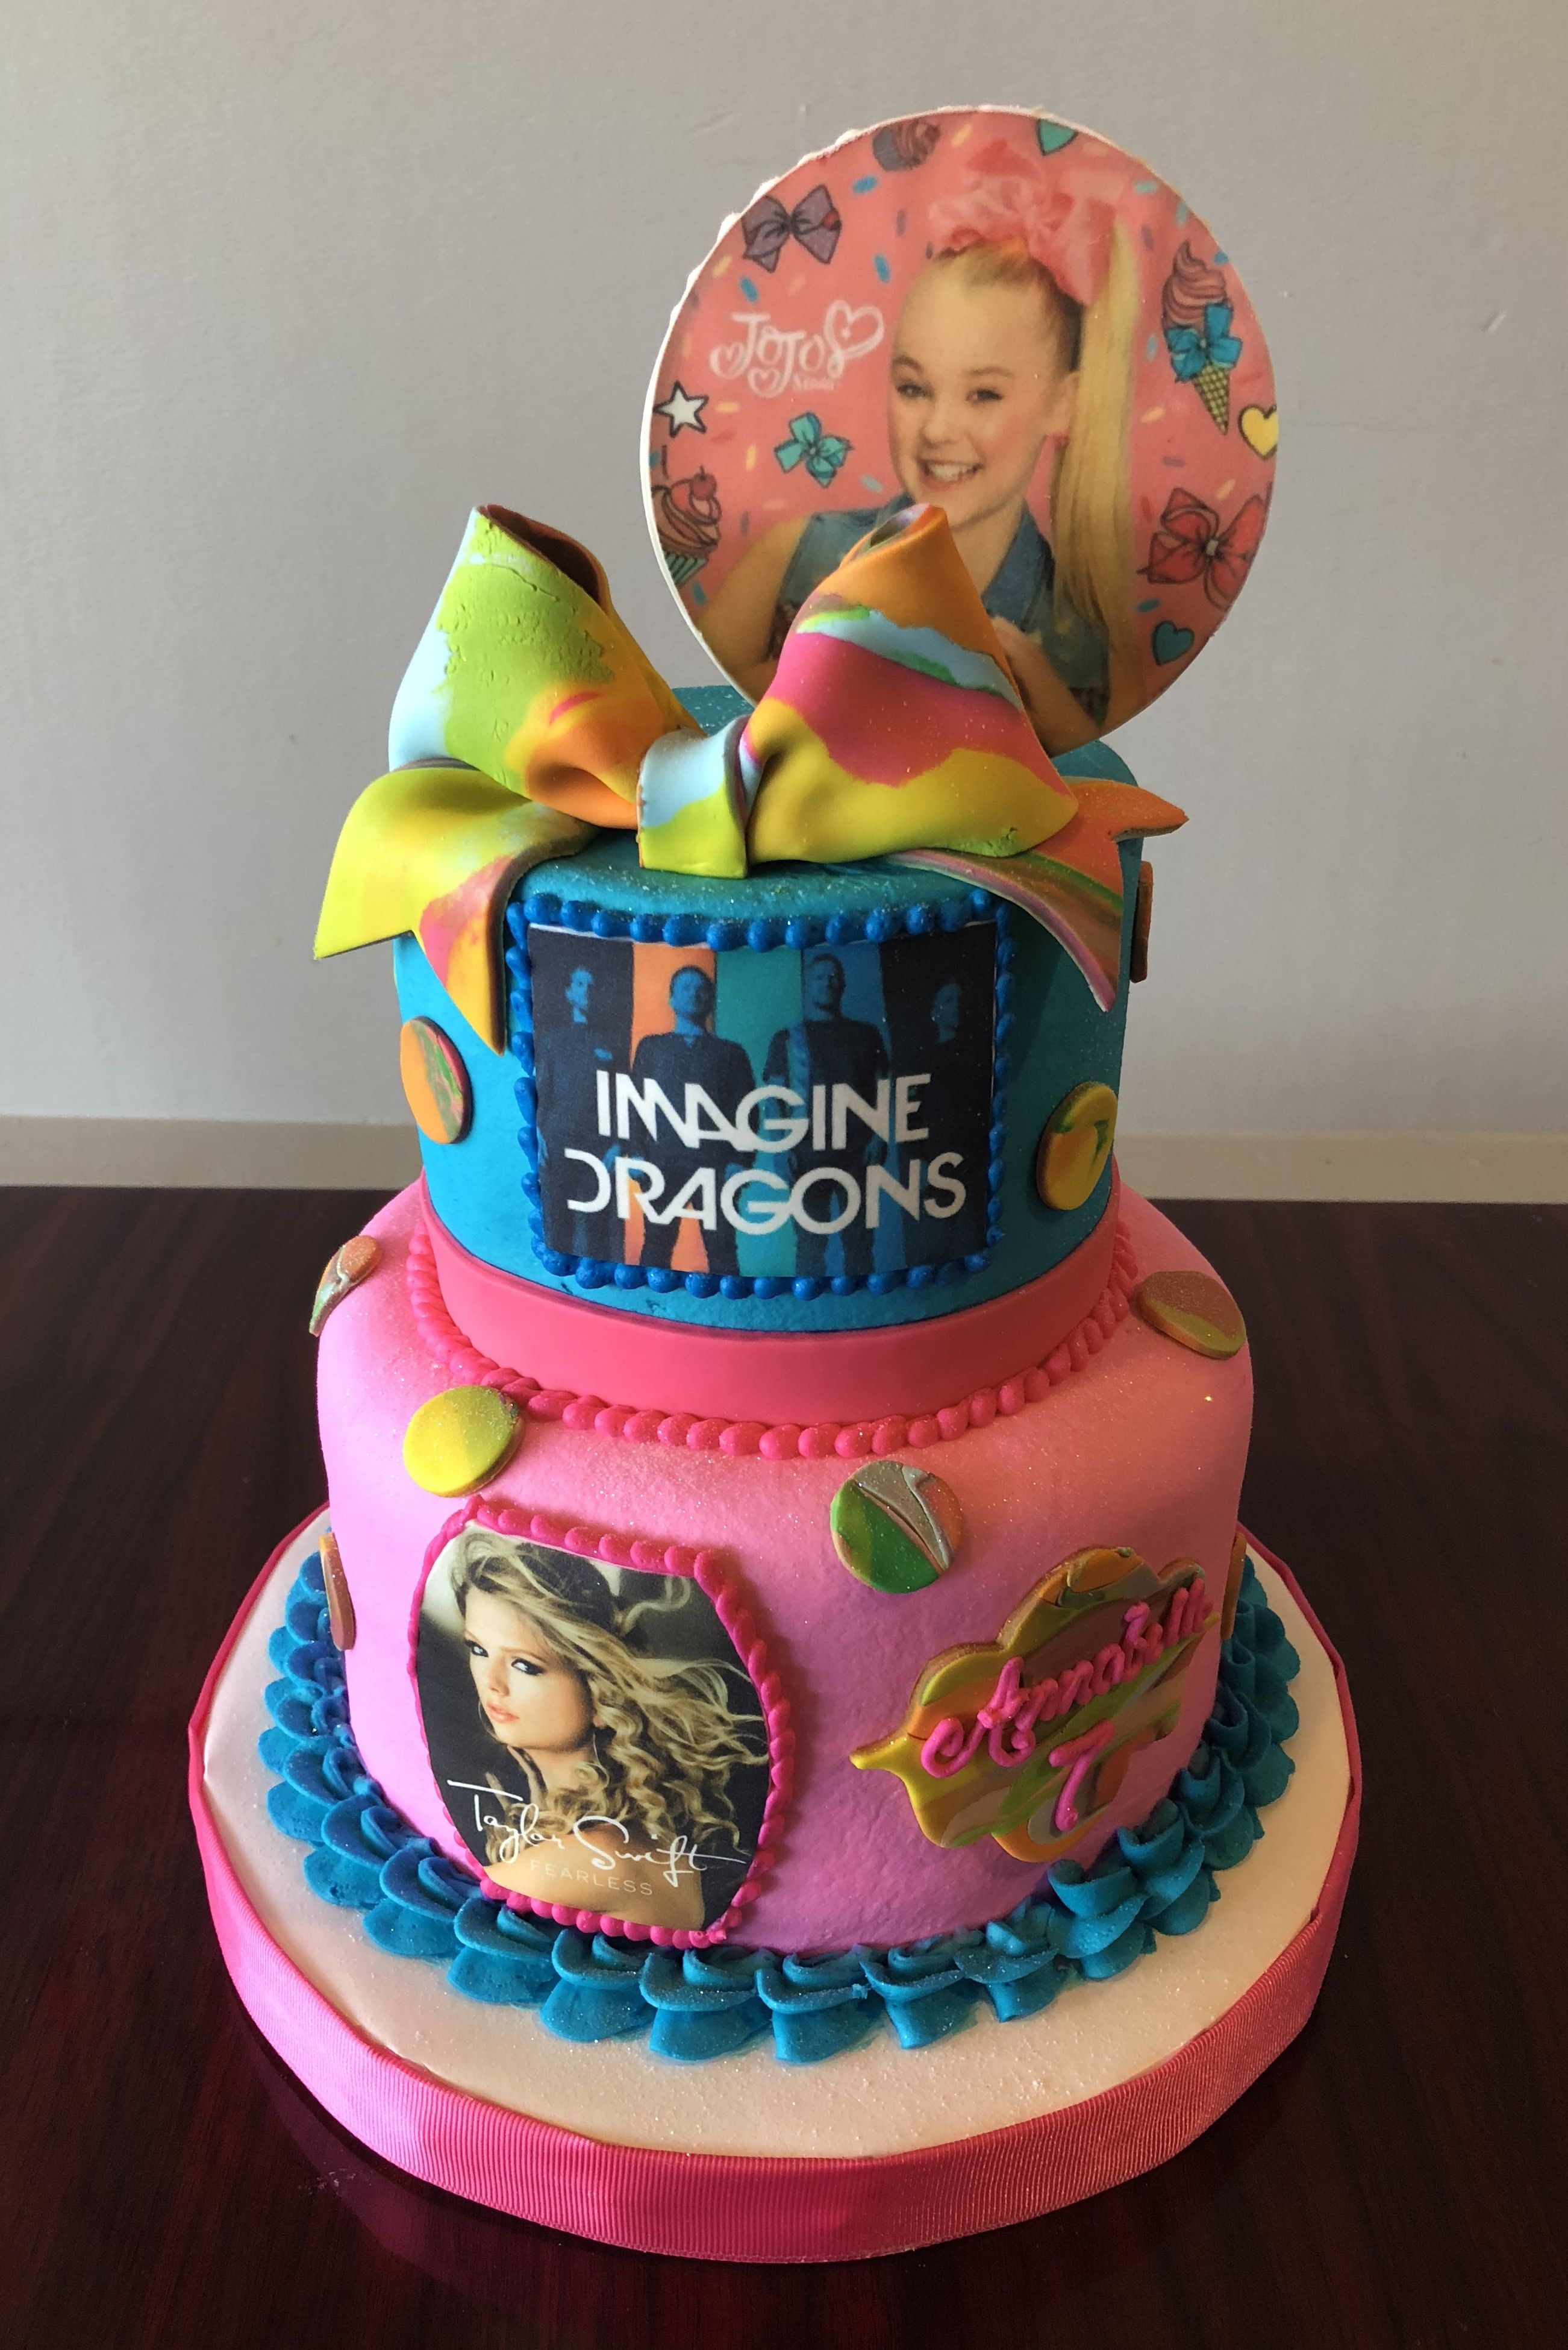 JoJo Siwa, Imagine Dragons and Taylor Swift Birthday Cake